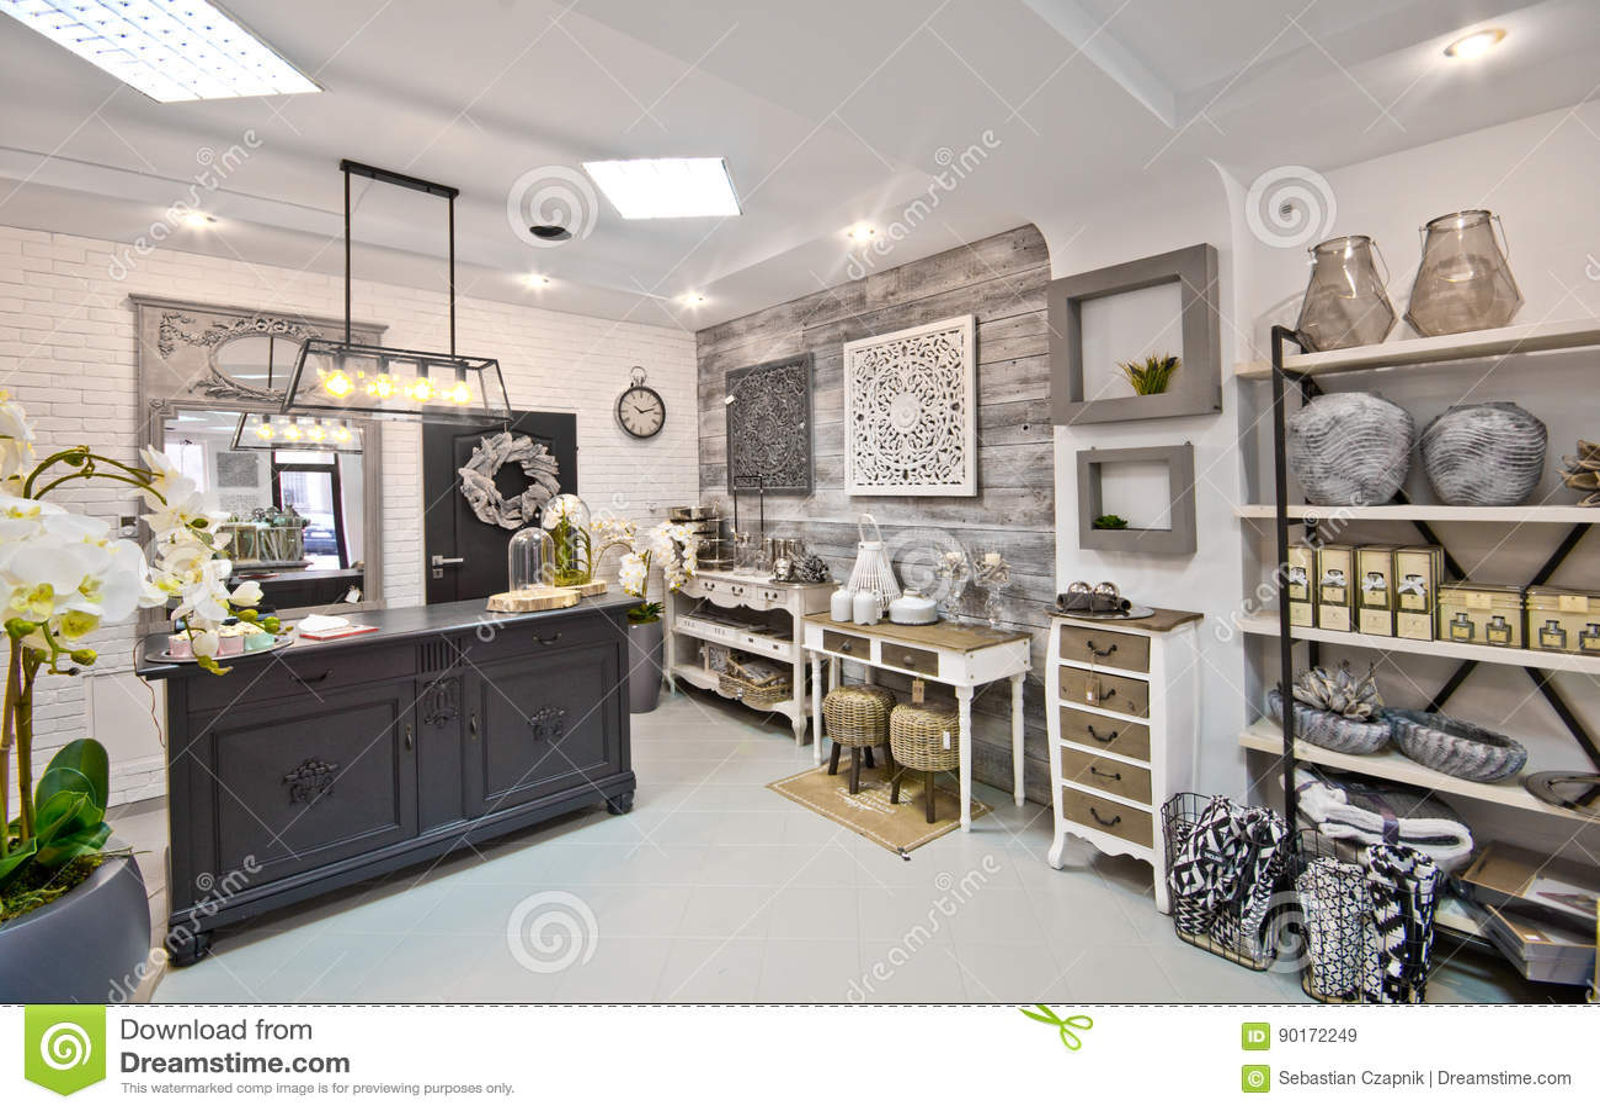 Home Decorations Shop Interior Stock Image Image Of Decorations Elegant 90172249